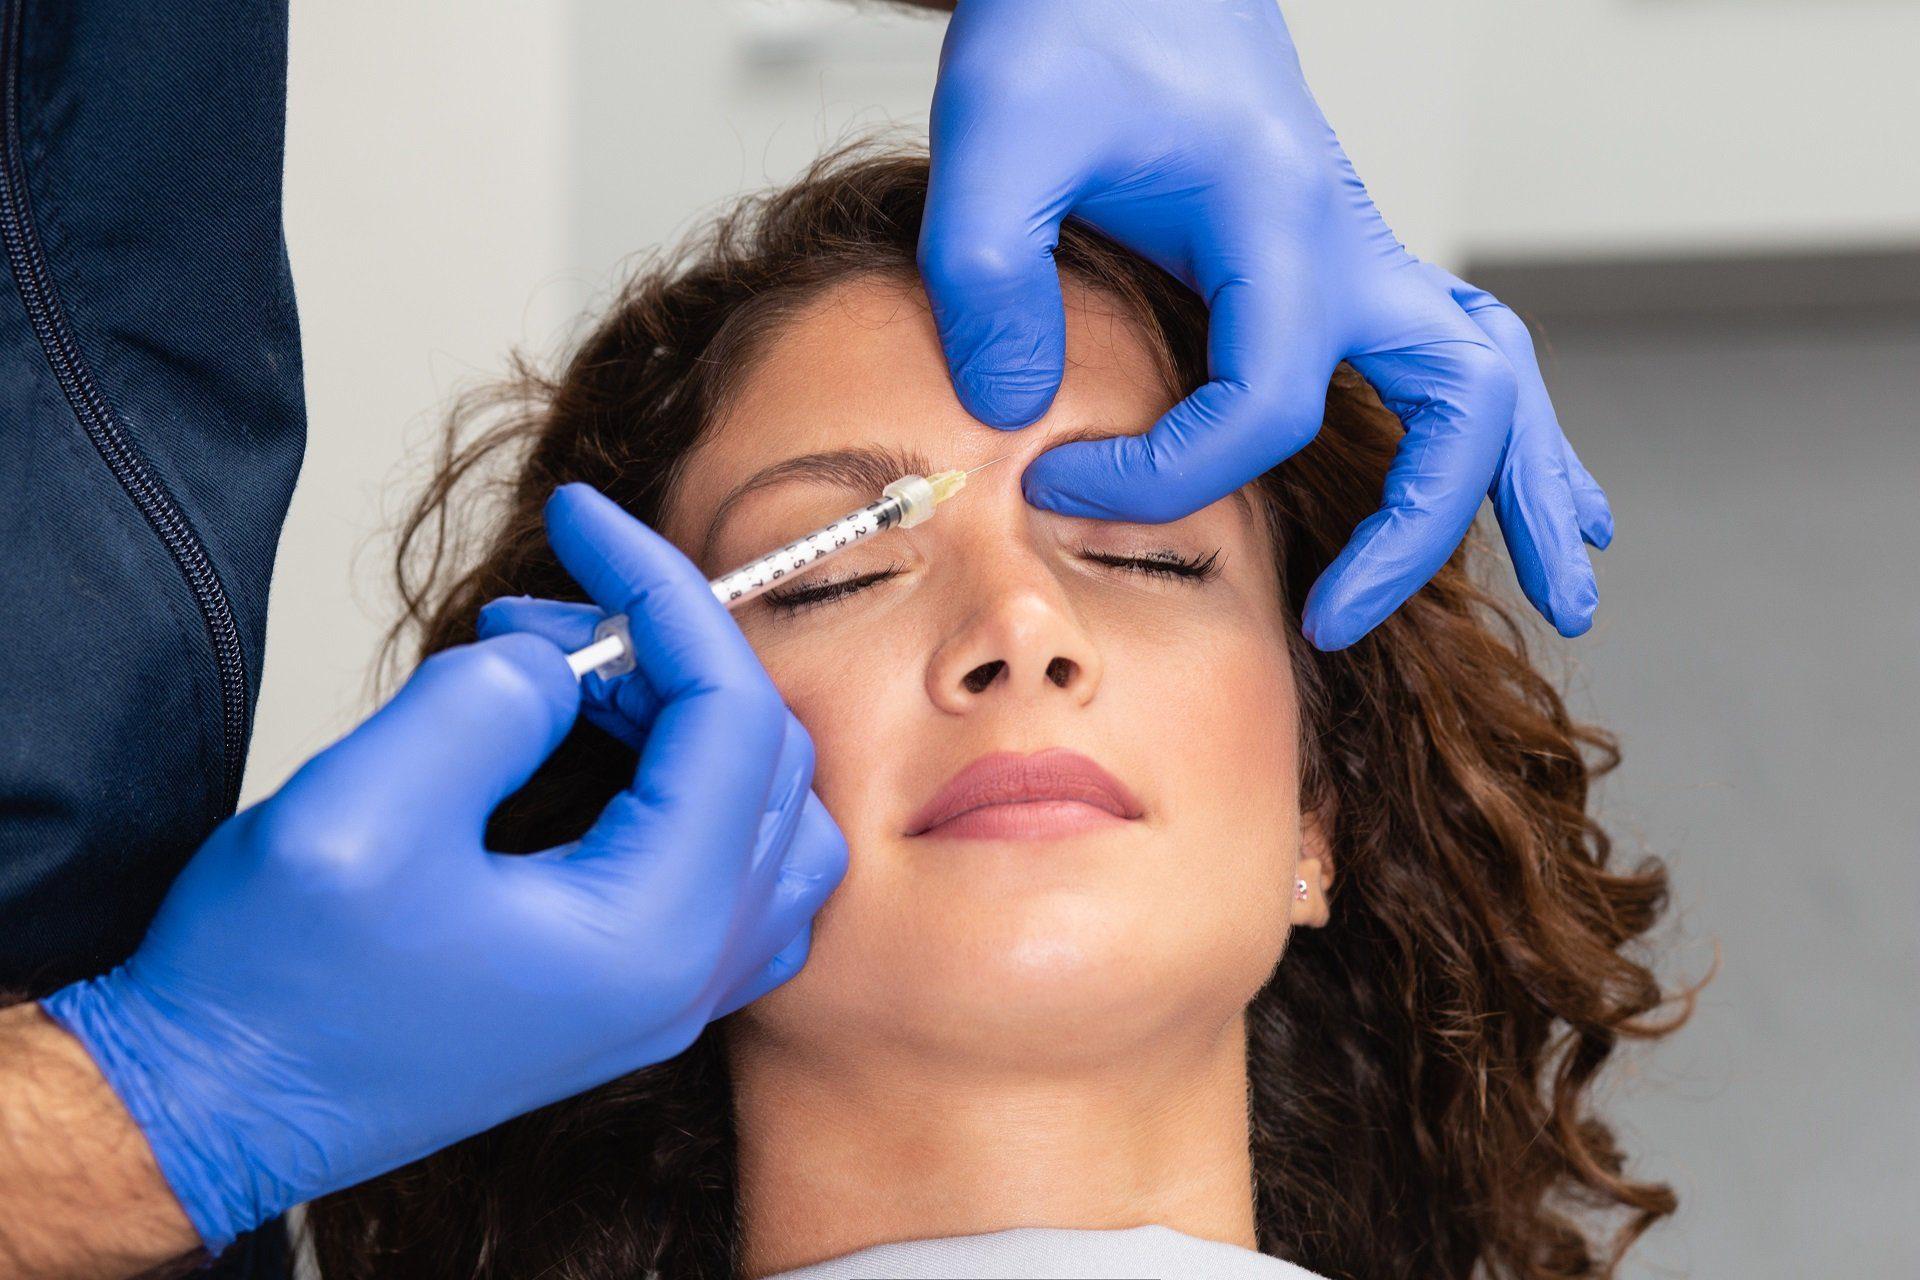 glabella-injection-Botox-treatment-New-Look-Dental-West-Kelowna.